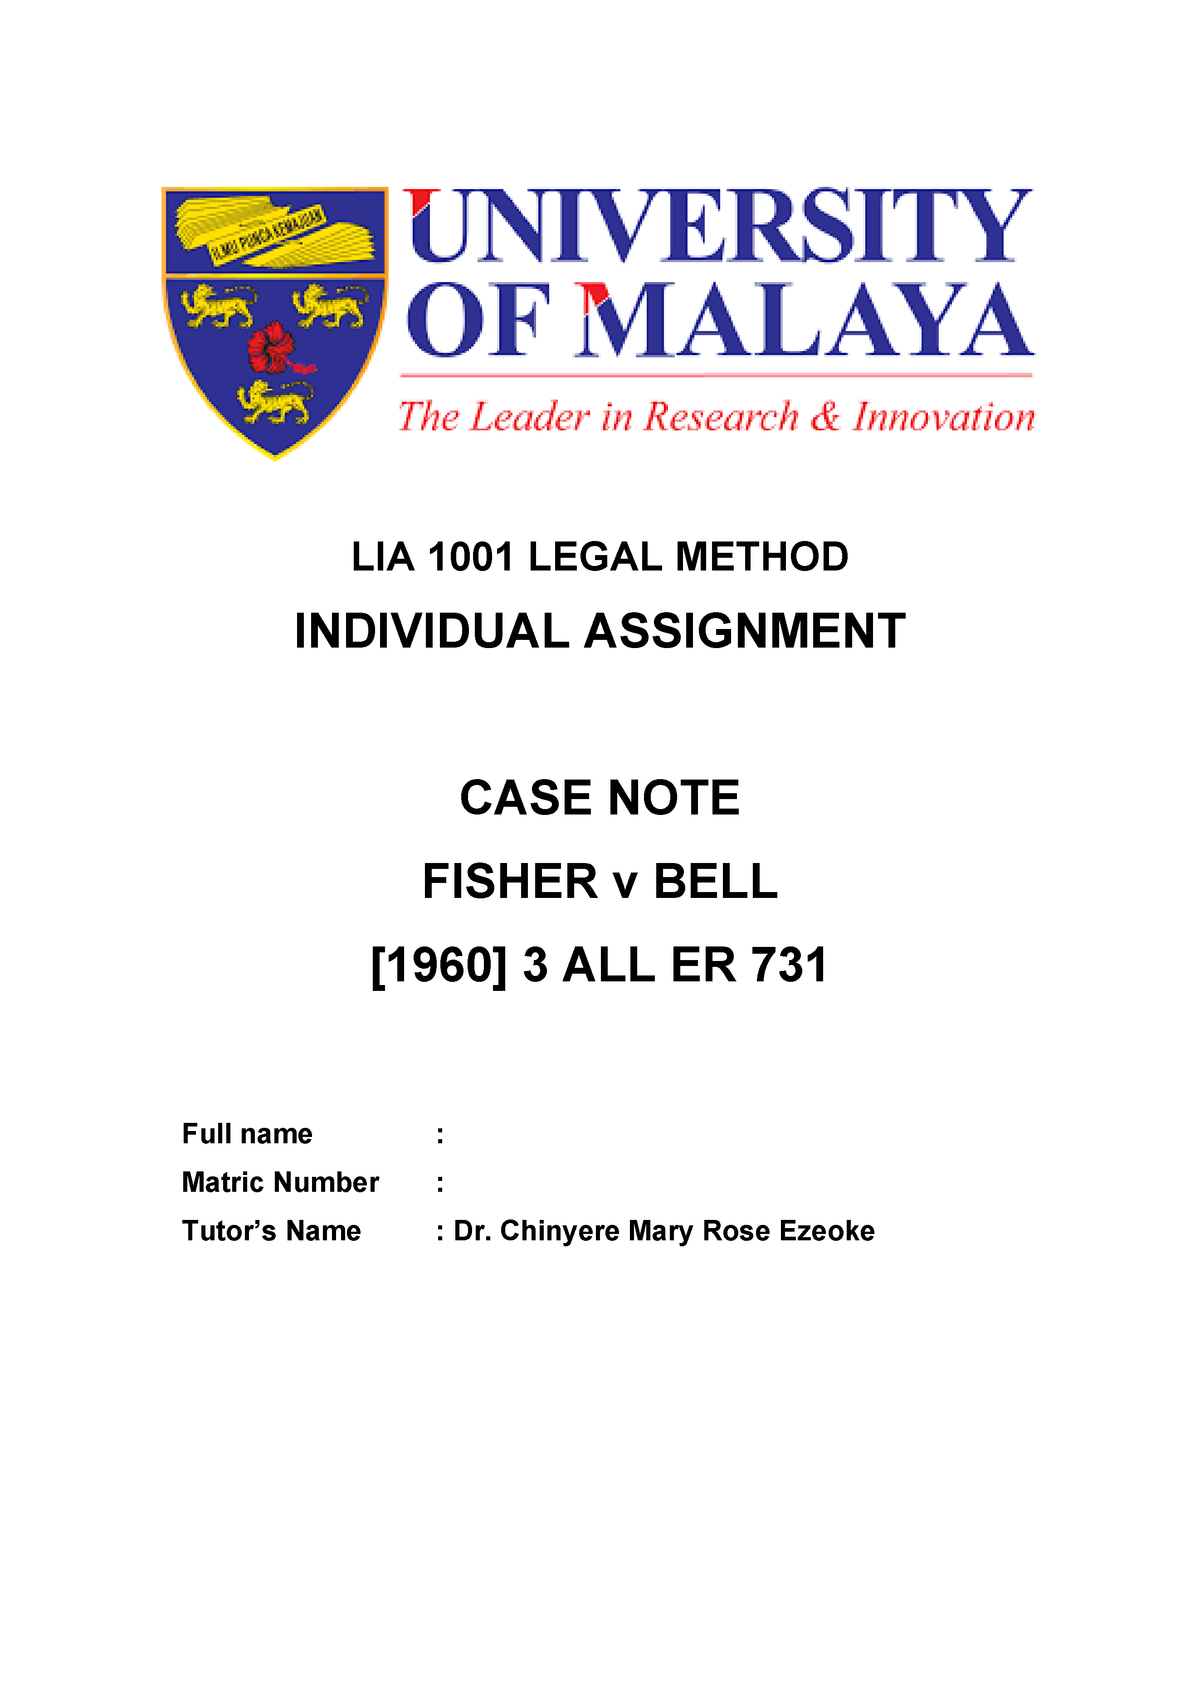 Case Summary(Fisher v Bell) - Legal Method LIA 1001 - StuDocu